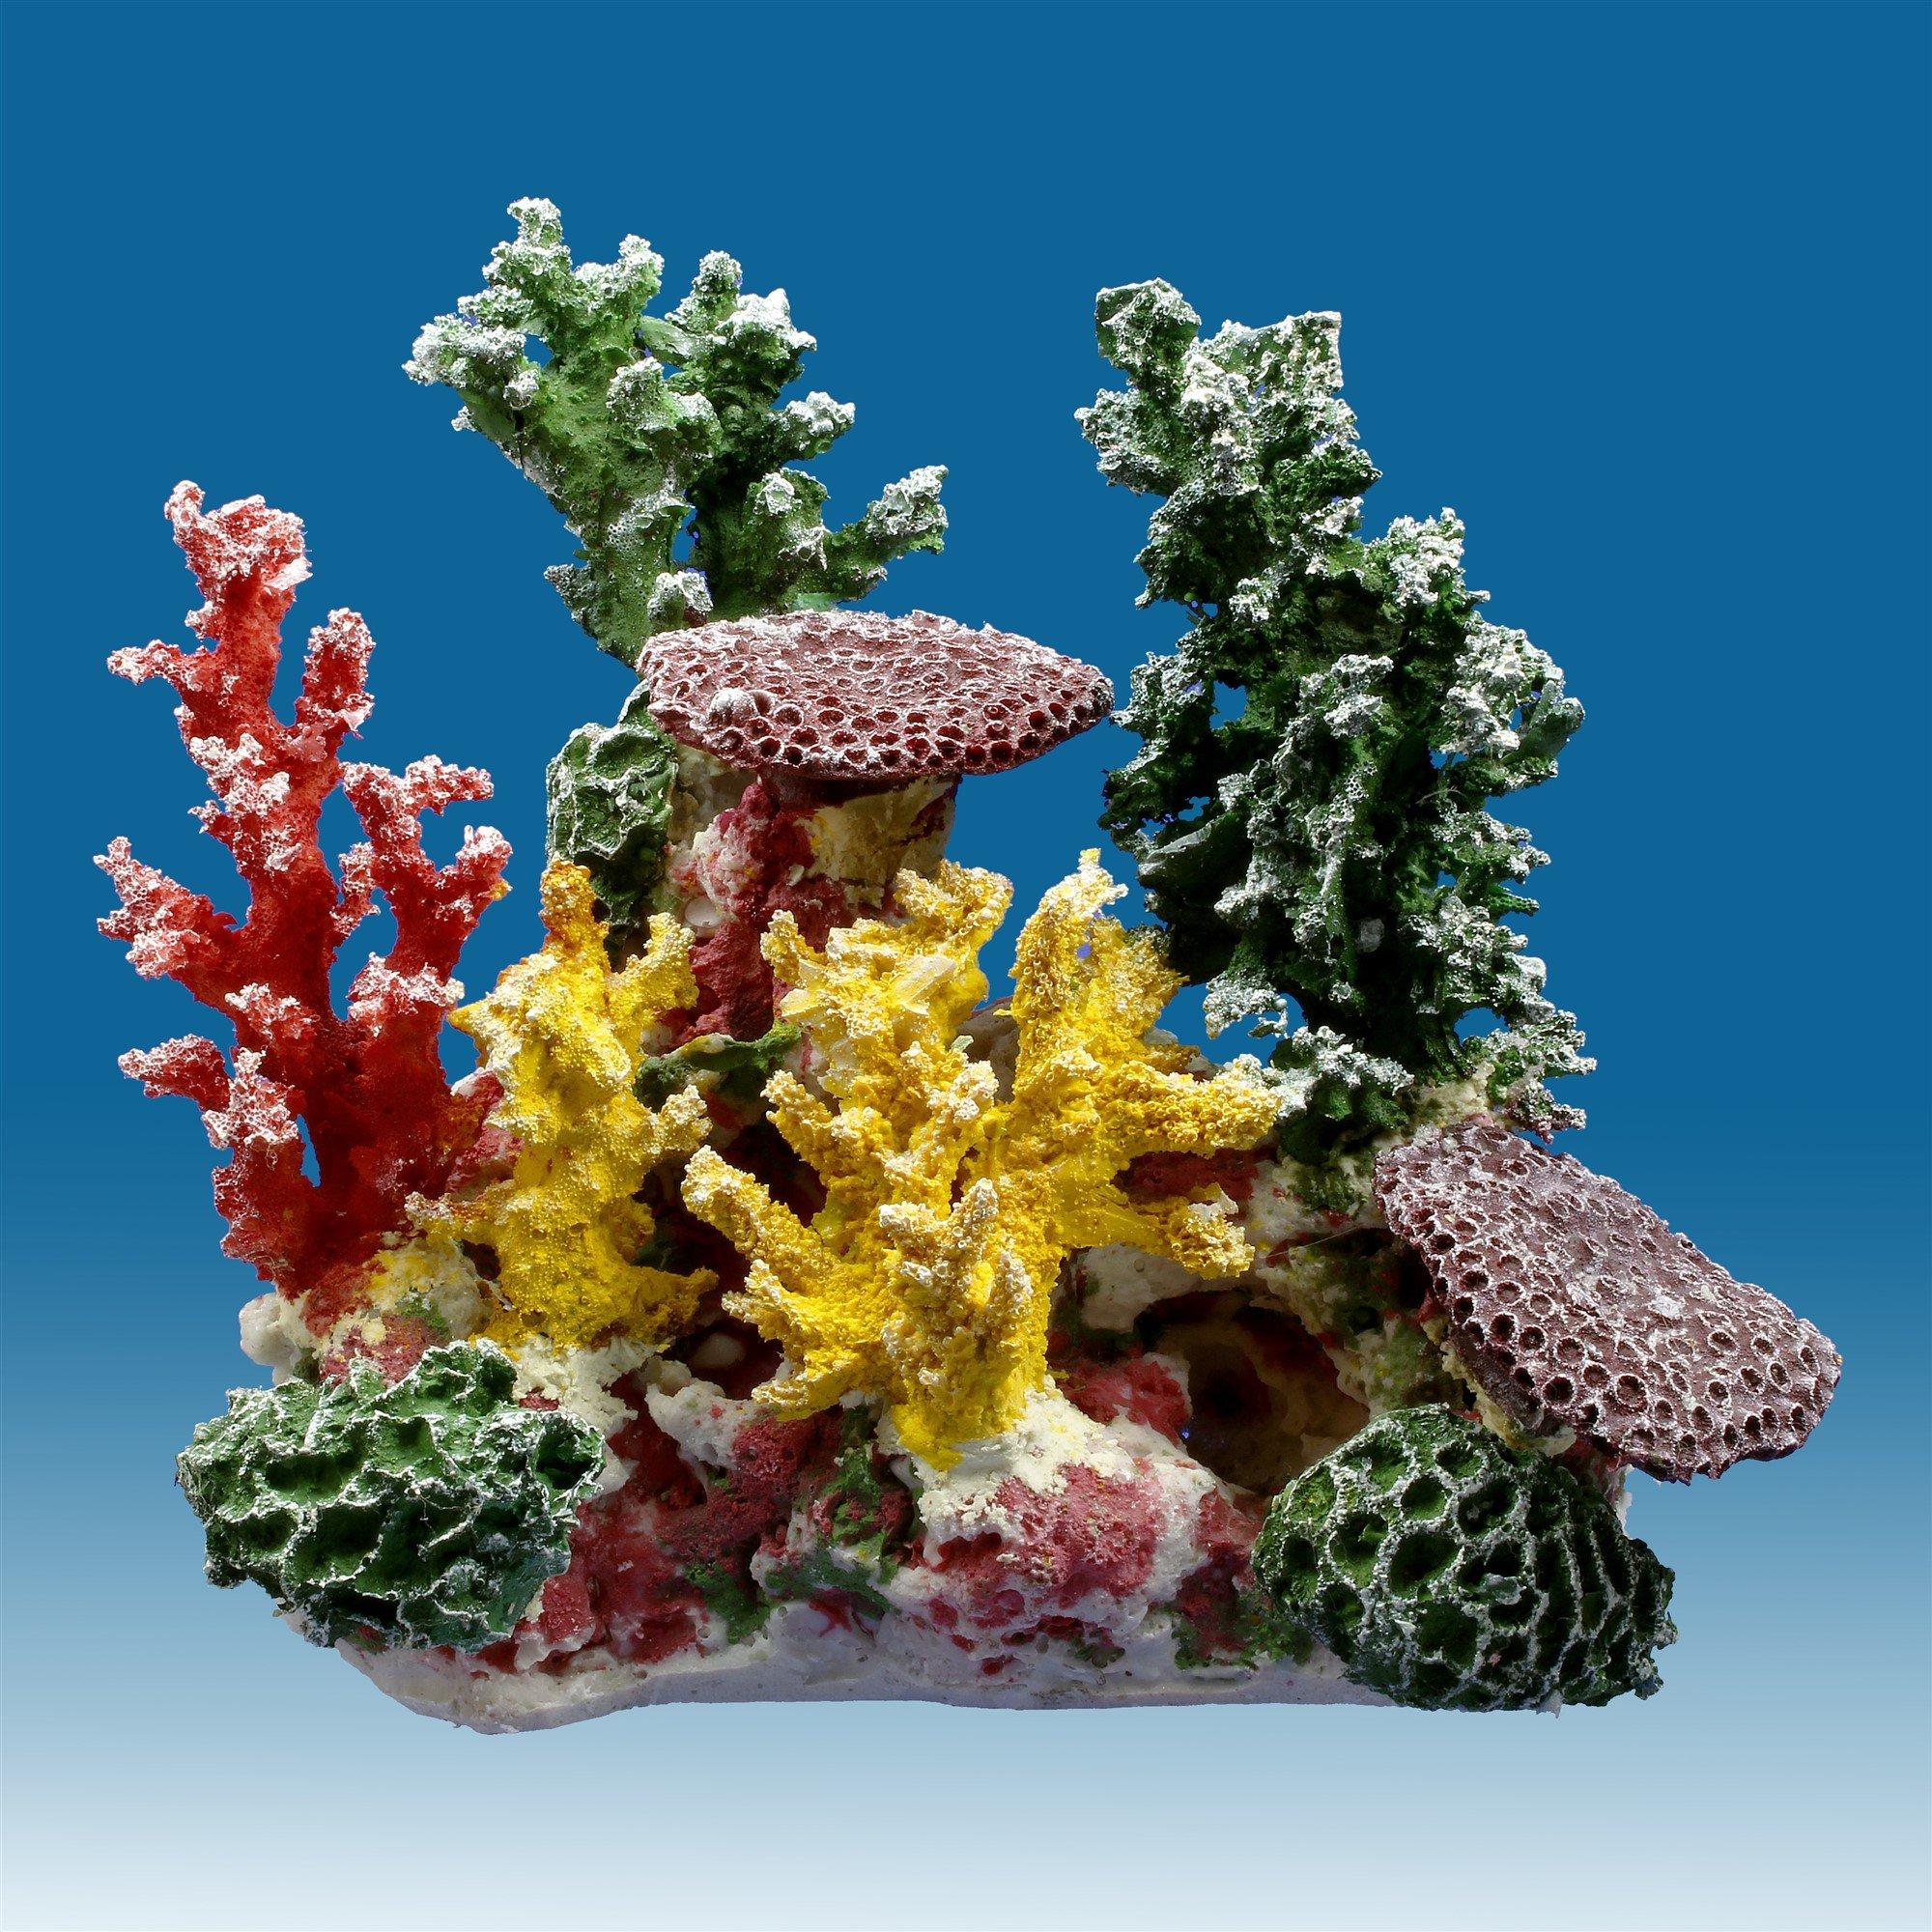 Besimple Artificial Coral Ornament Glowing Effect Resin Aquarium Plants Coral Aquarium Fish Tank Decorations